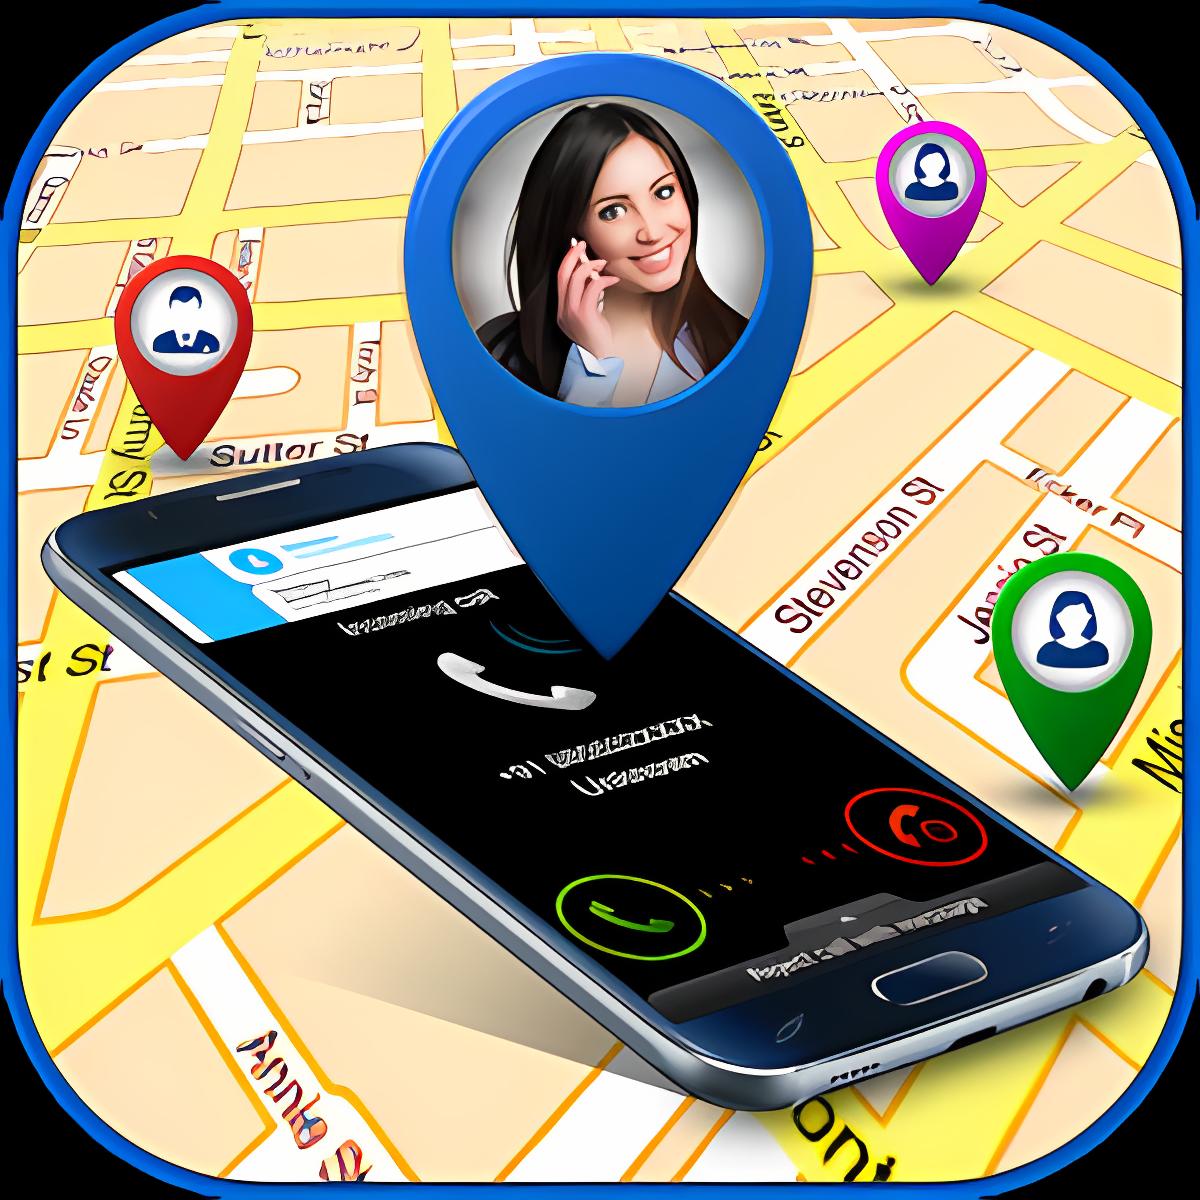 Mobile Caller Number Location Tracker